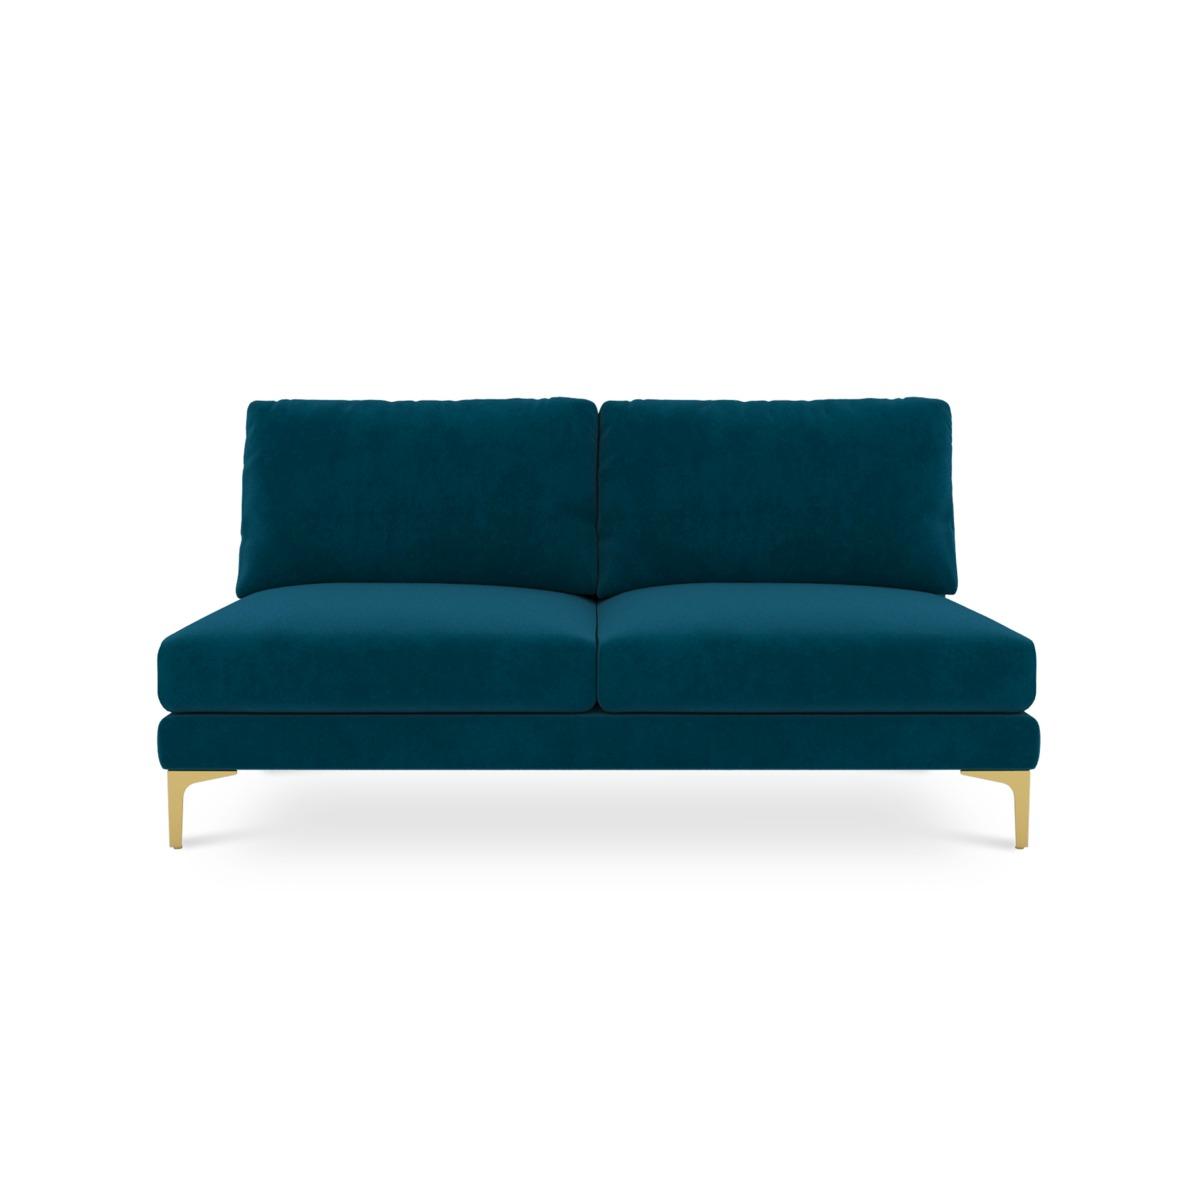 Adams Armless 2-Seater, Turquoise (Brass Leg)